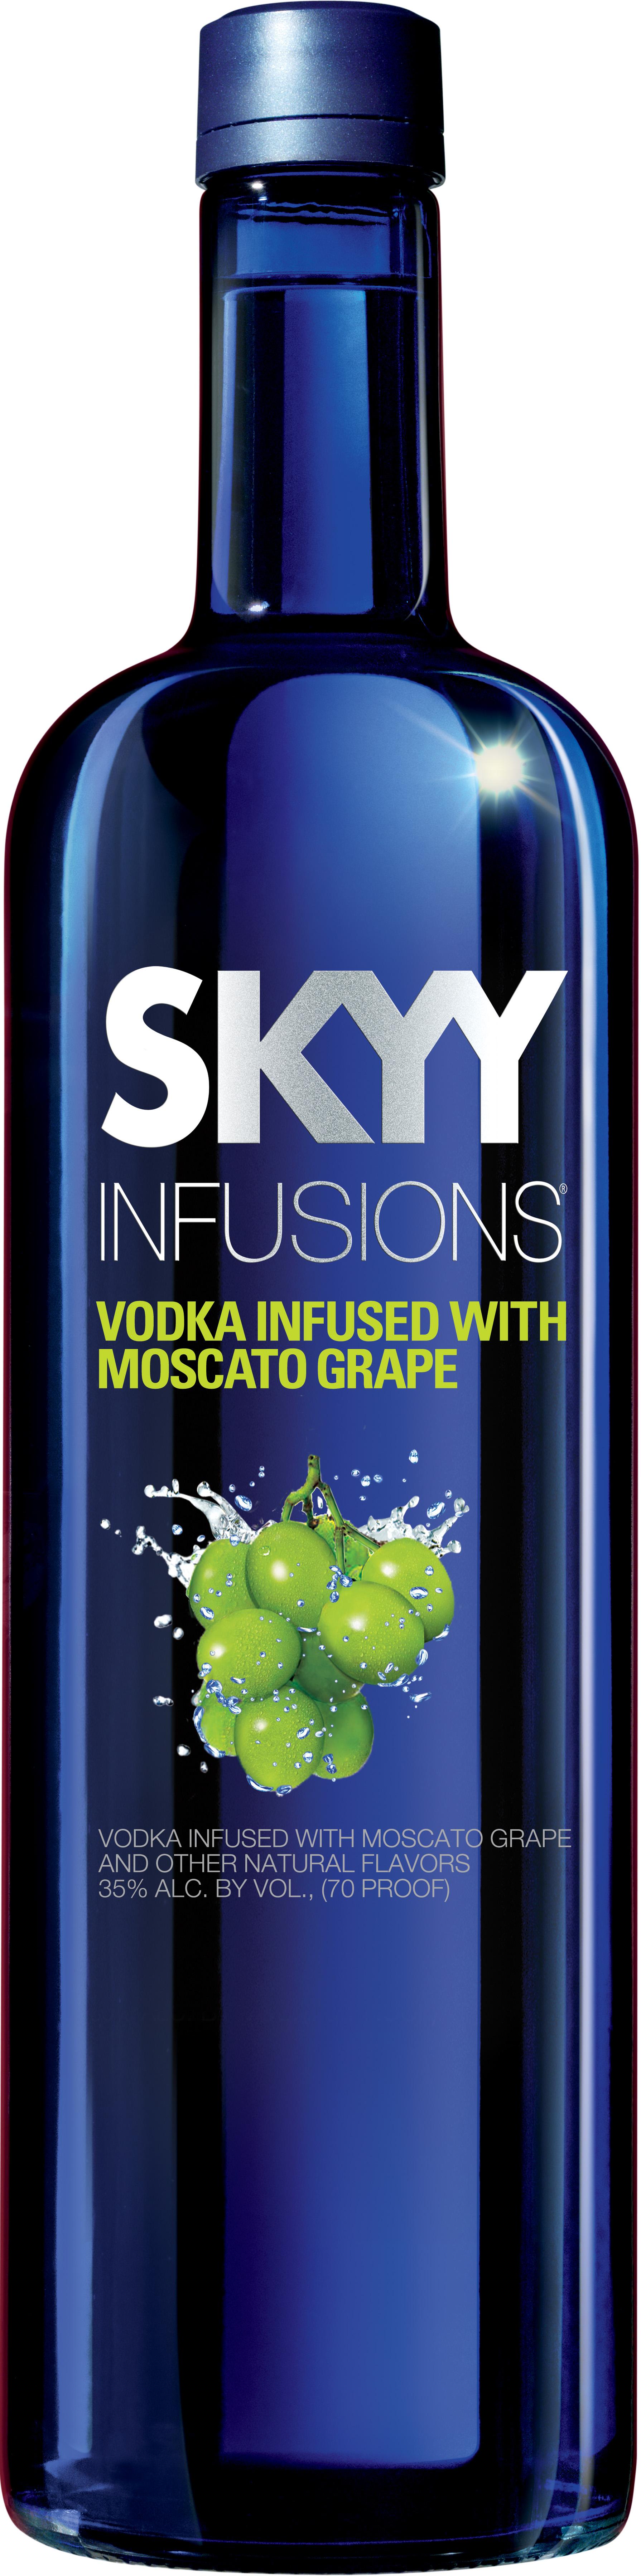 Skyy Infusions Moscato Vodka